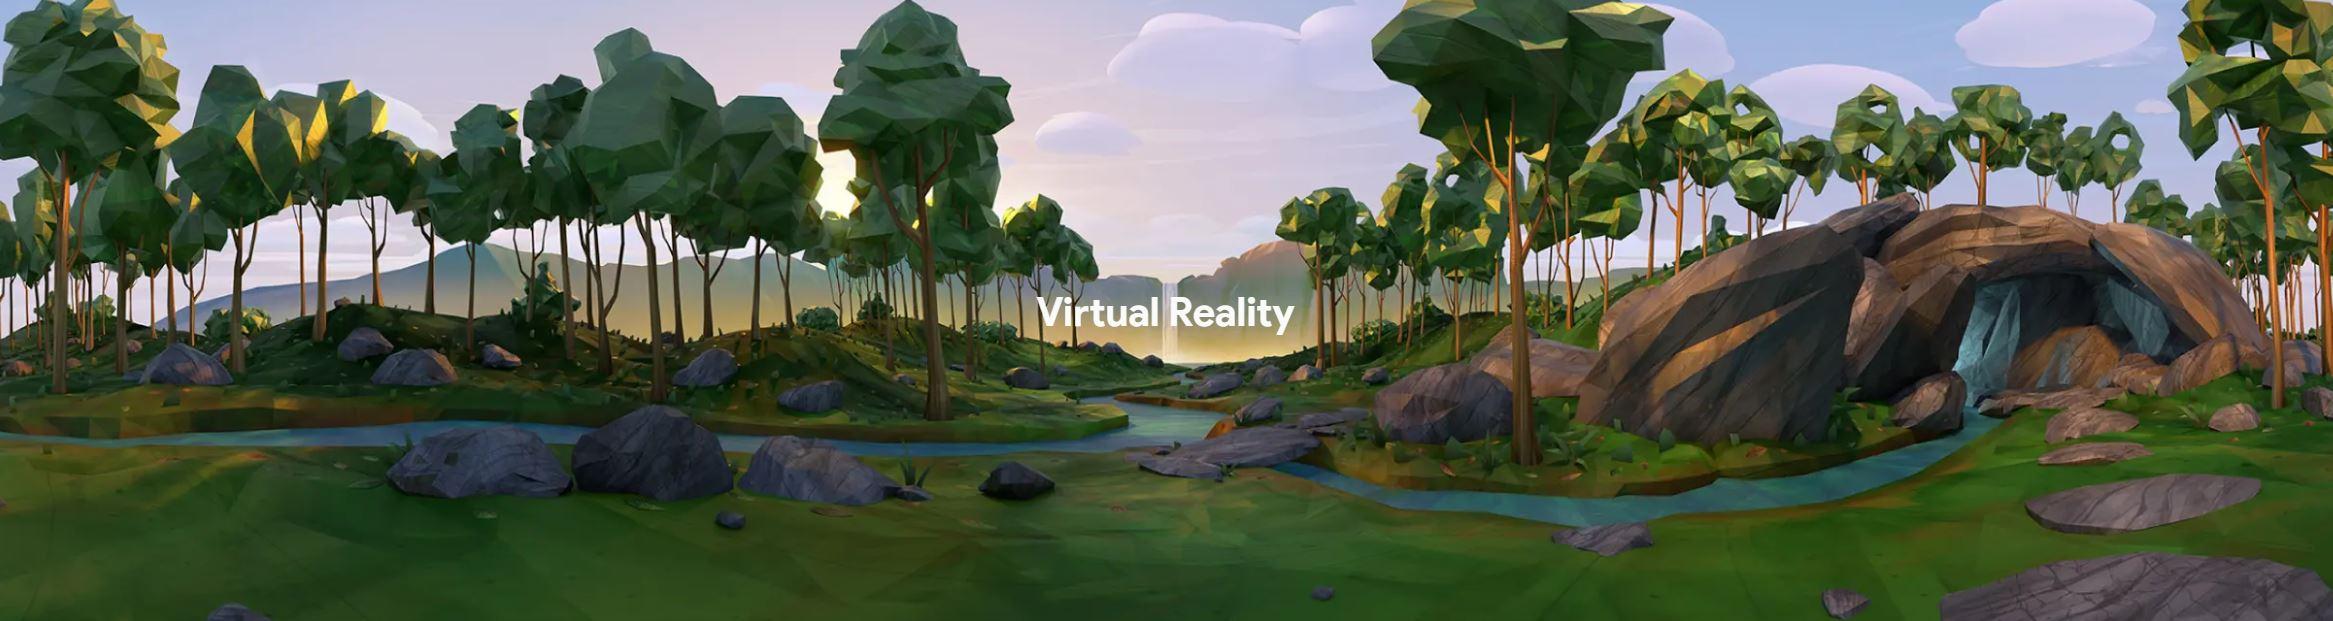 Google Daydream VR World